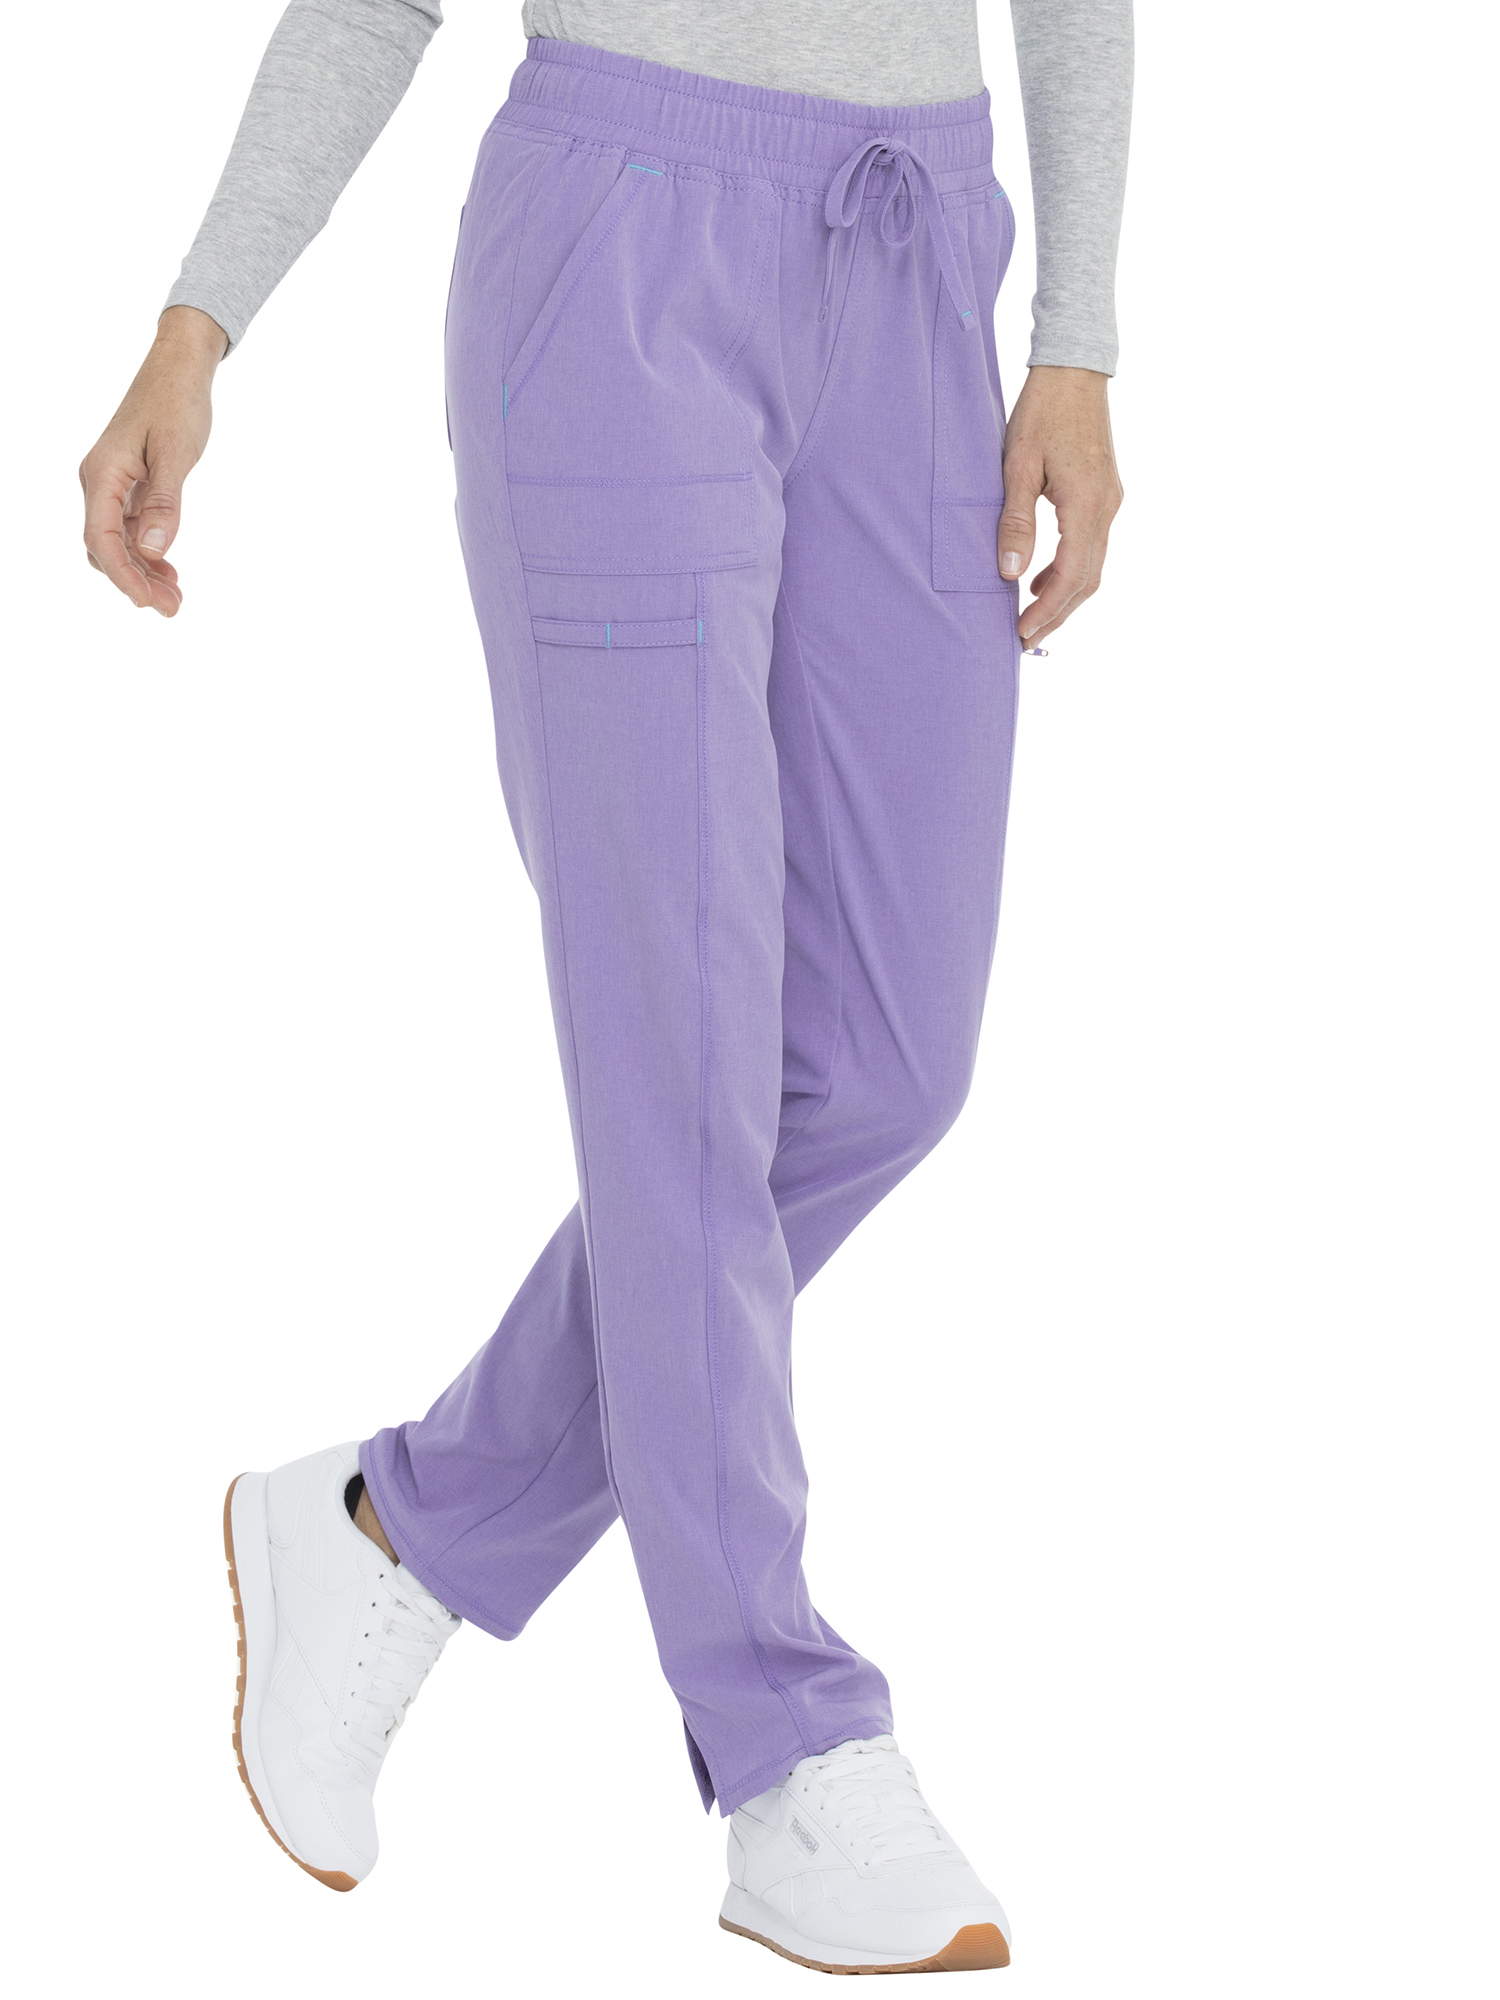 ScrubStar Scrub Pants Performance Yoga Pants Heather Lavender **New**